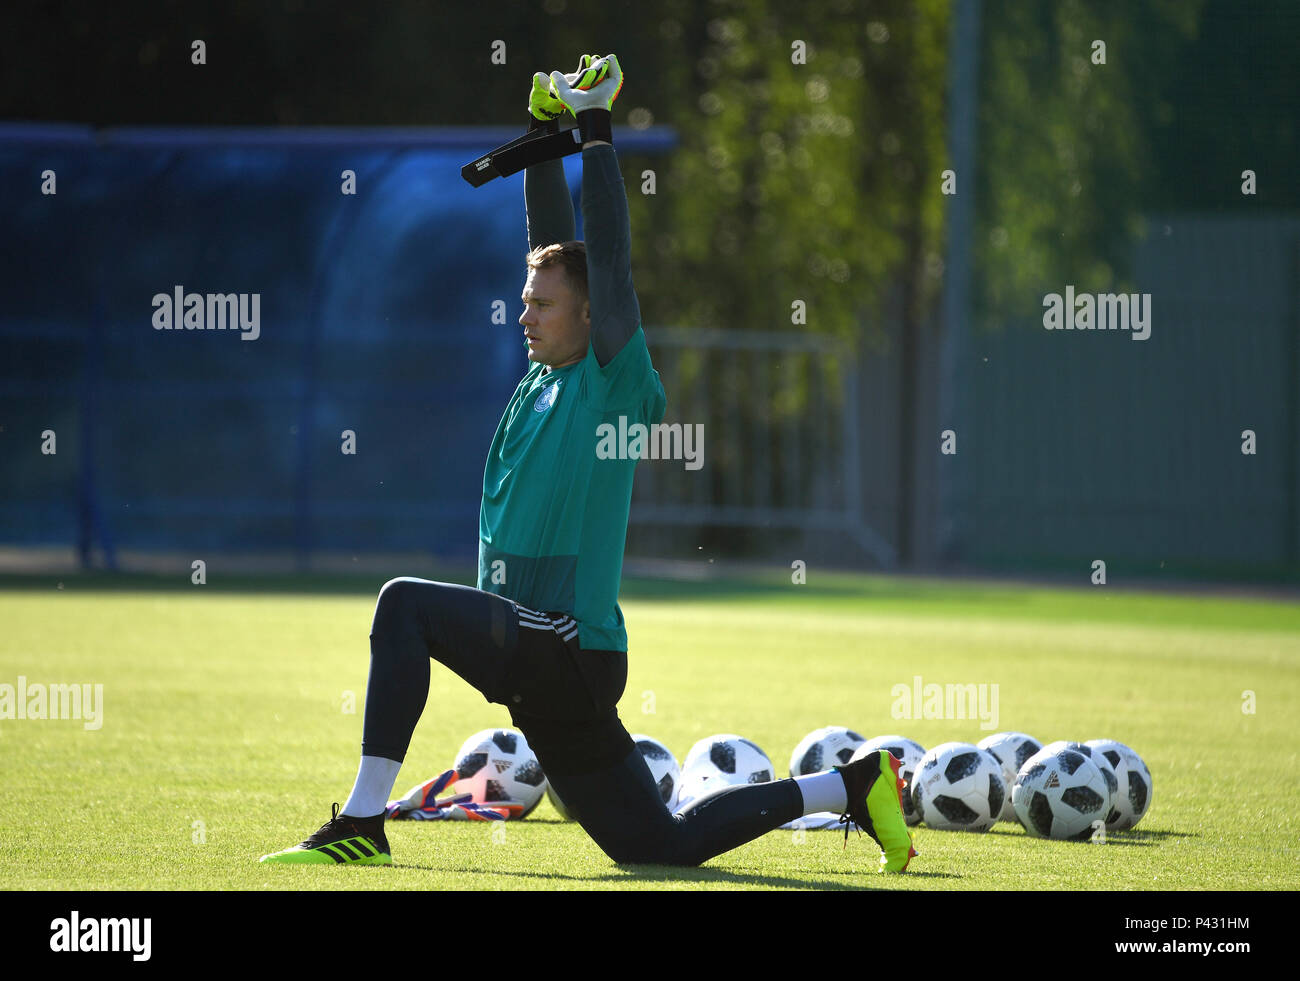 Vatutinki, Russia. 16th June, 2018. Soccer, World Cup, German team, final training. Goalkeeper Manuel Neuer. Credit: Ina Fassbender/dpa/Alamy Live News - Stock Image